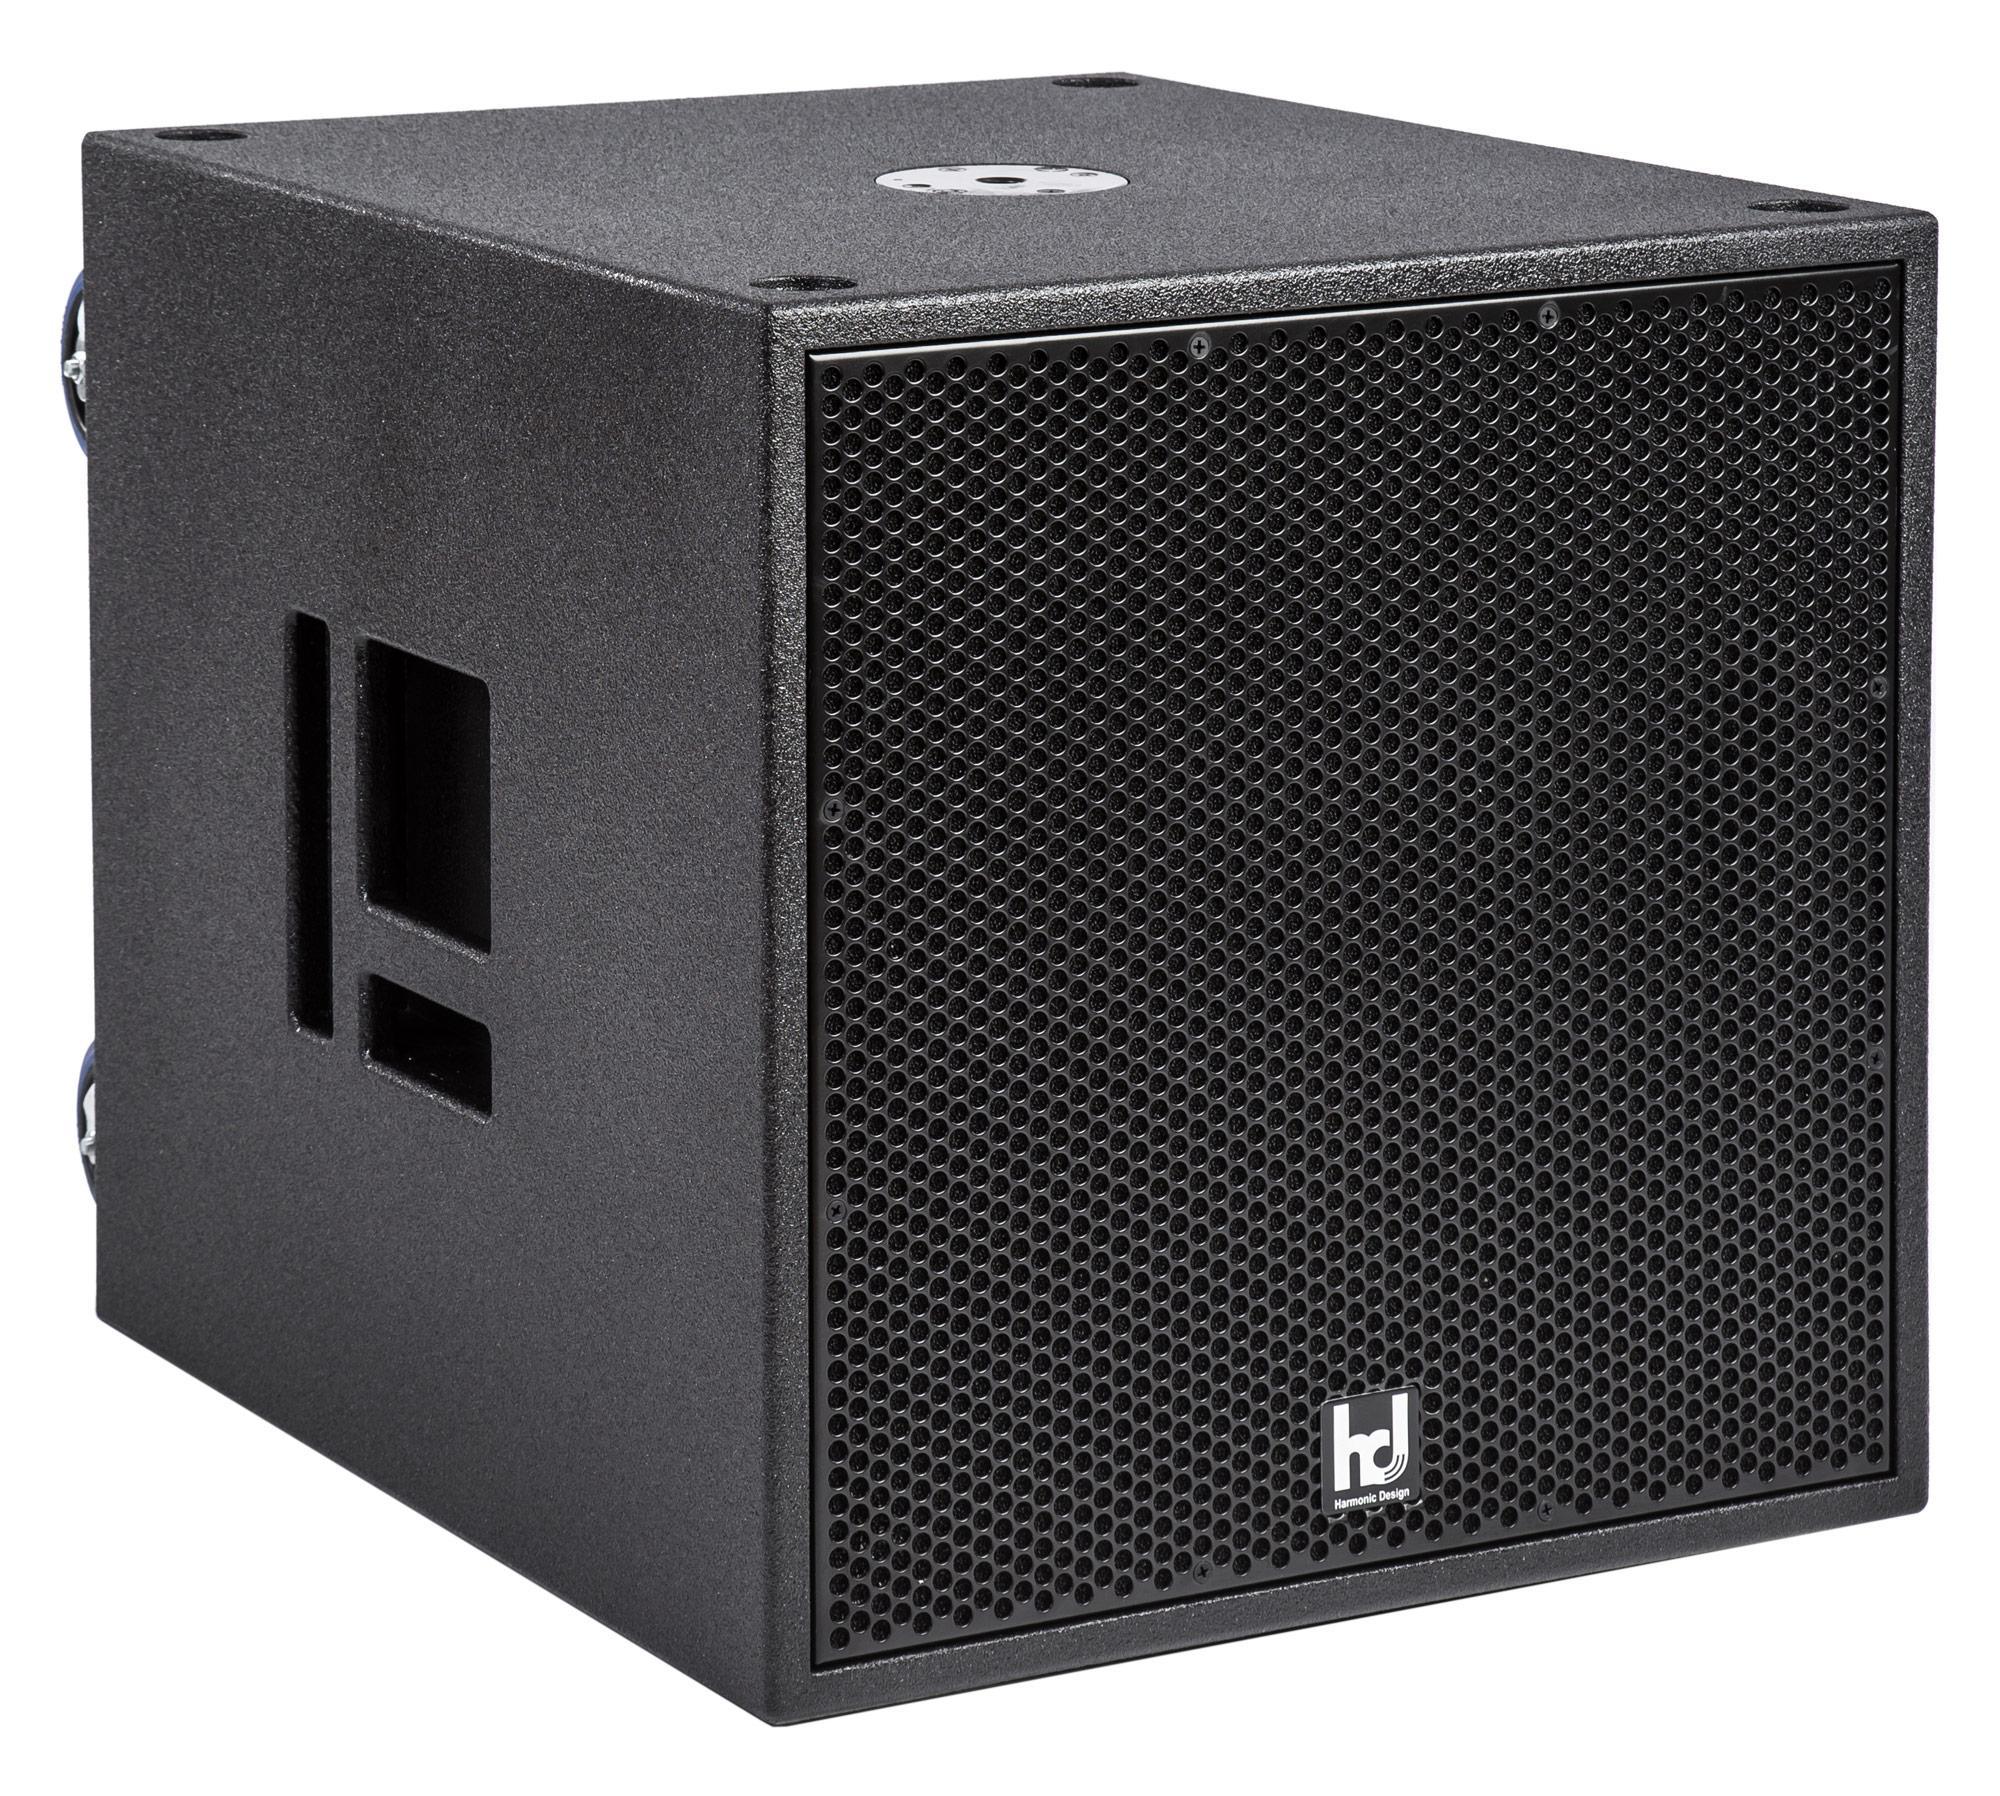 Harmonic Design P18 Multi DSP Aktiv Subwoofer, 4100 Watt Digitalcontroller, 1x 2500W 2x 800 W, mit Rollen